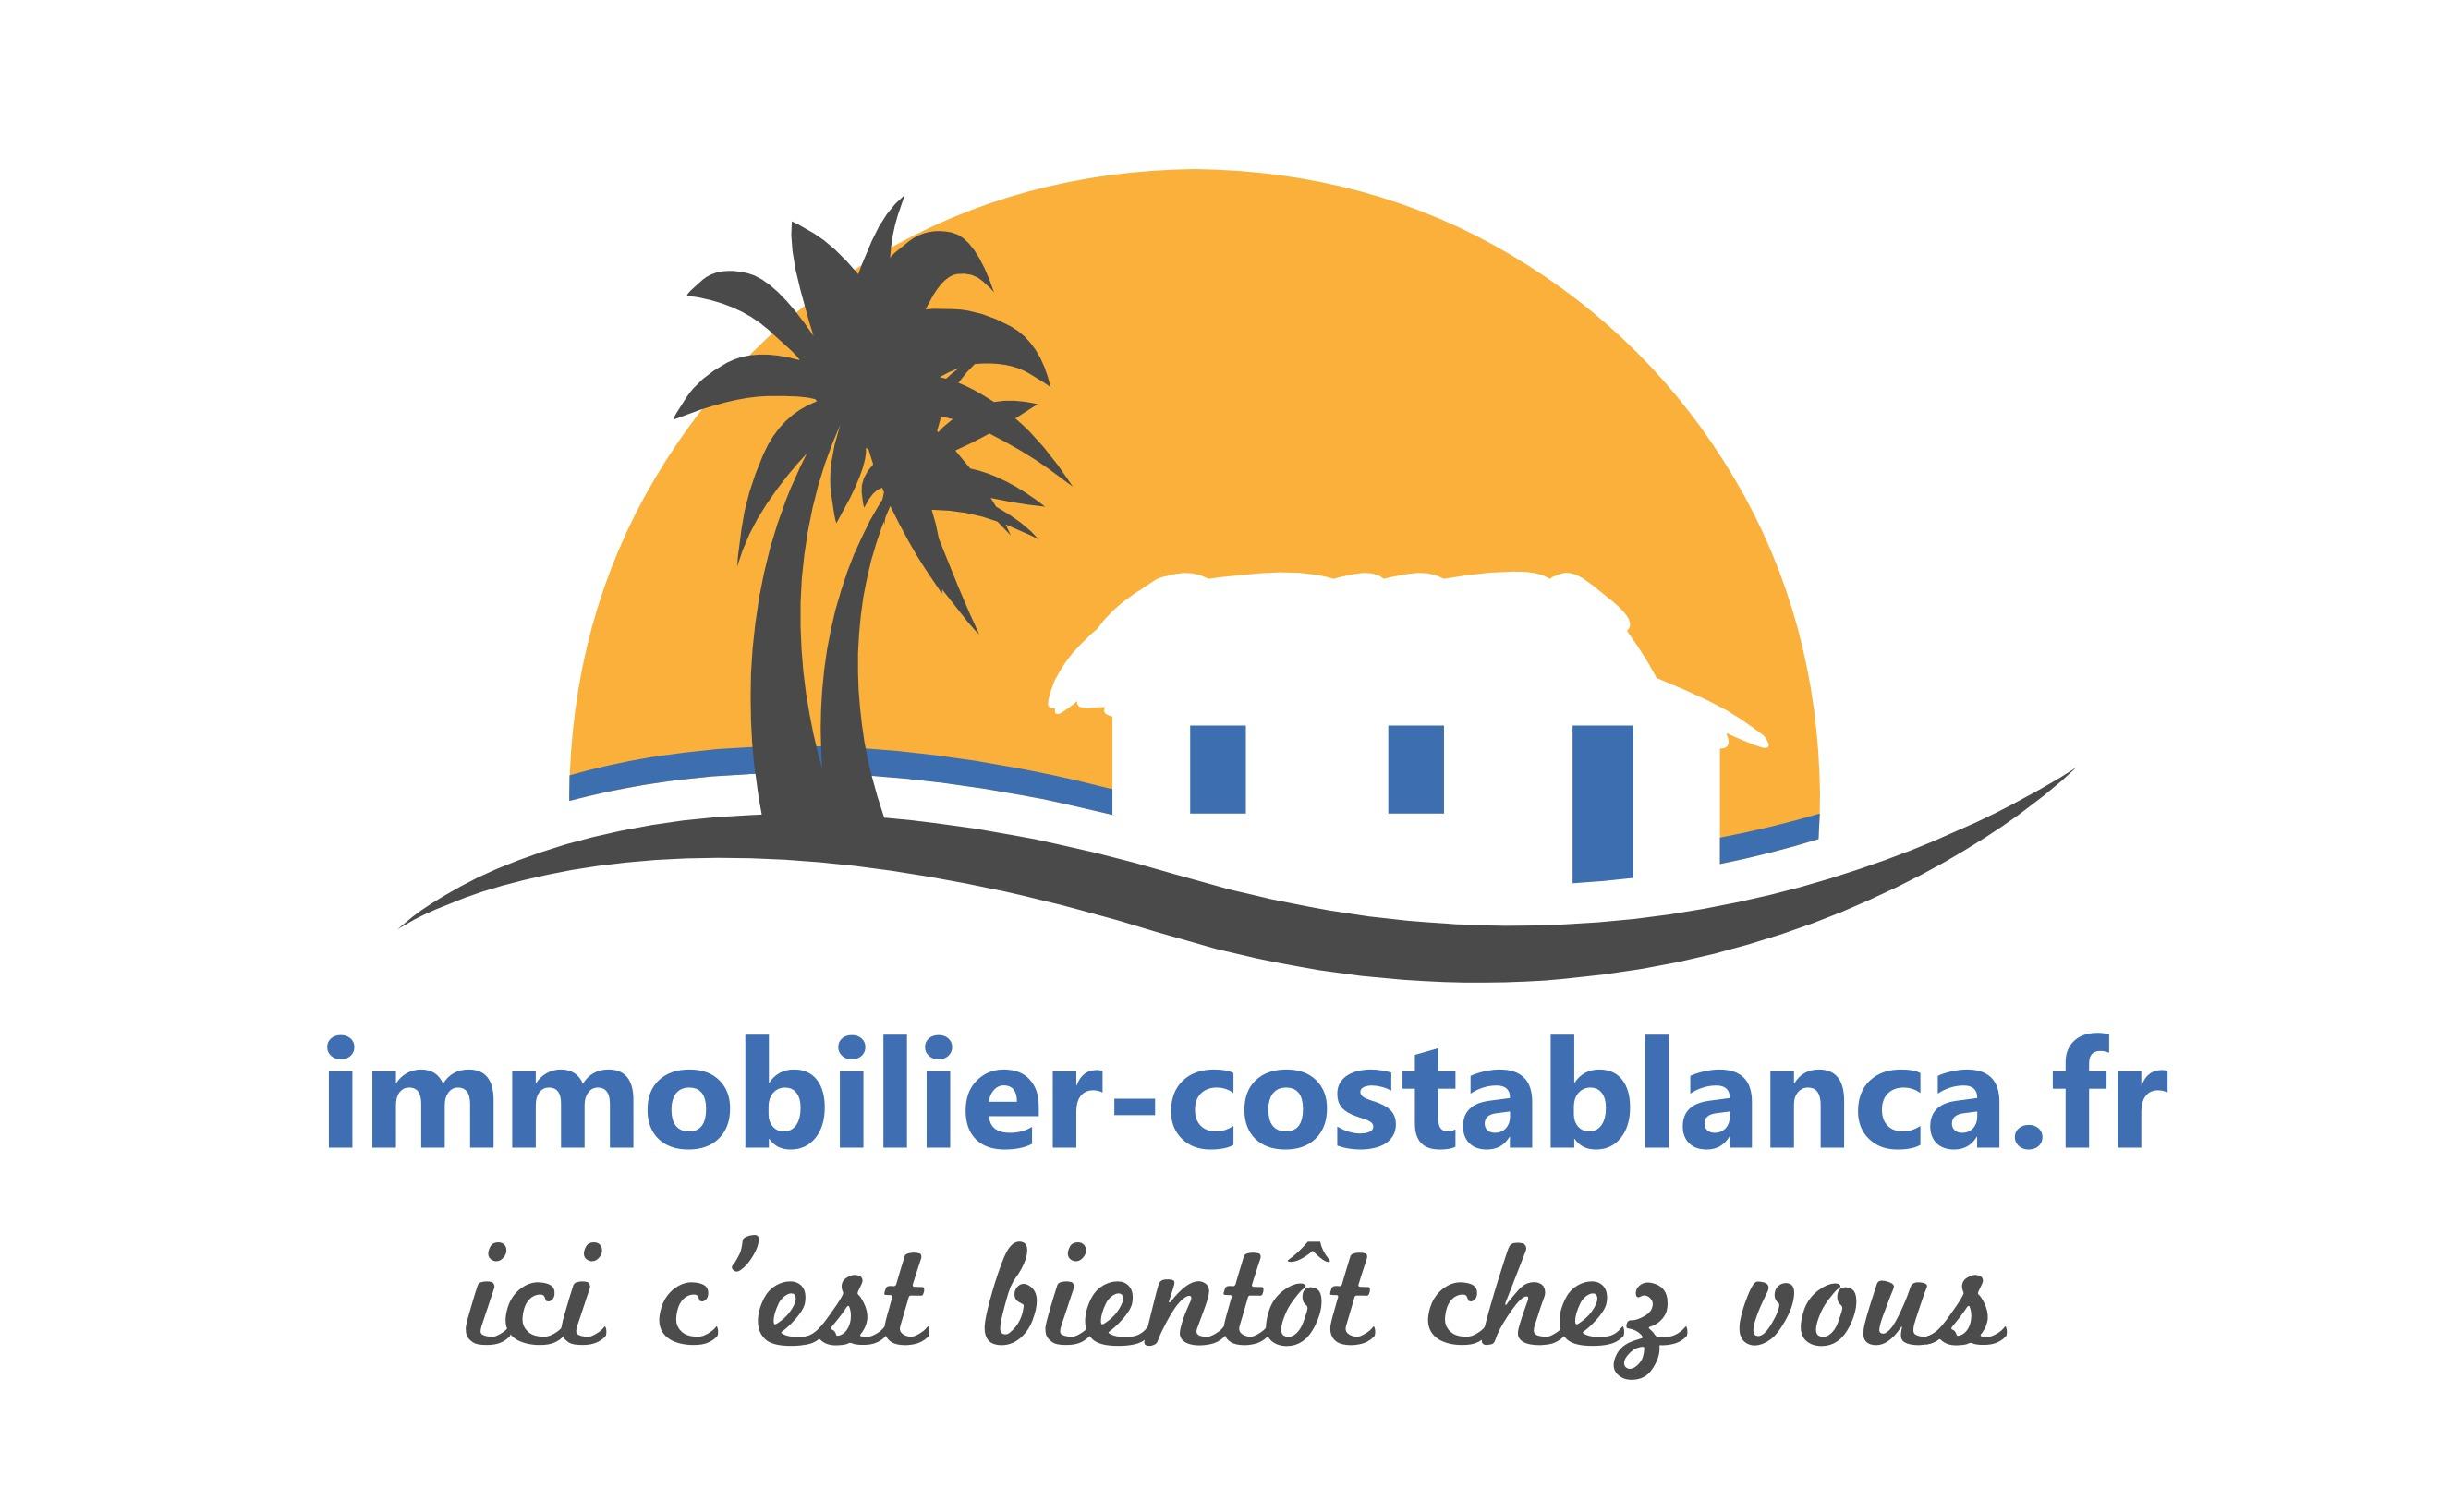 IMMOBILIER - COSTABLANCA.FR